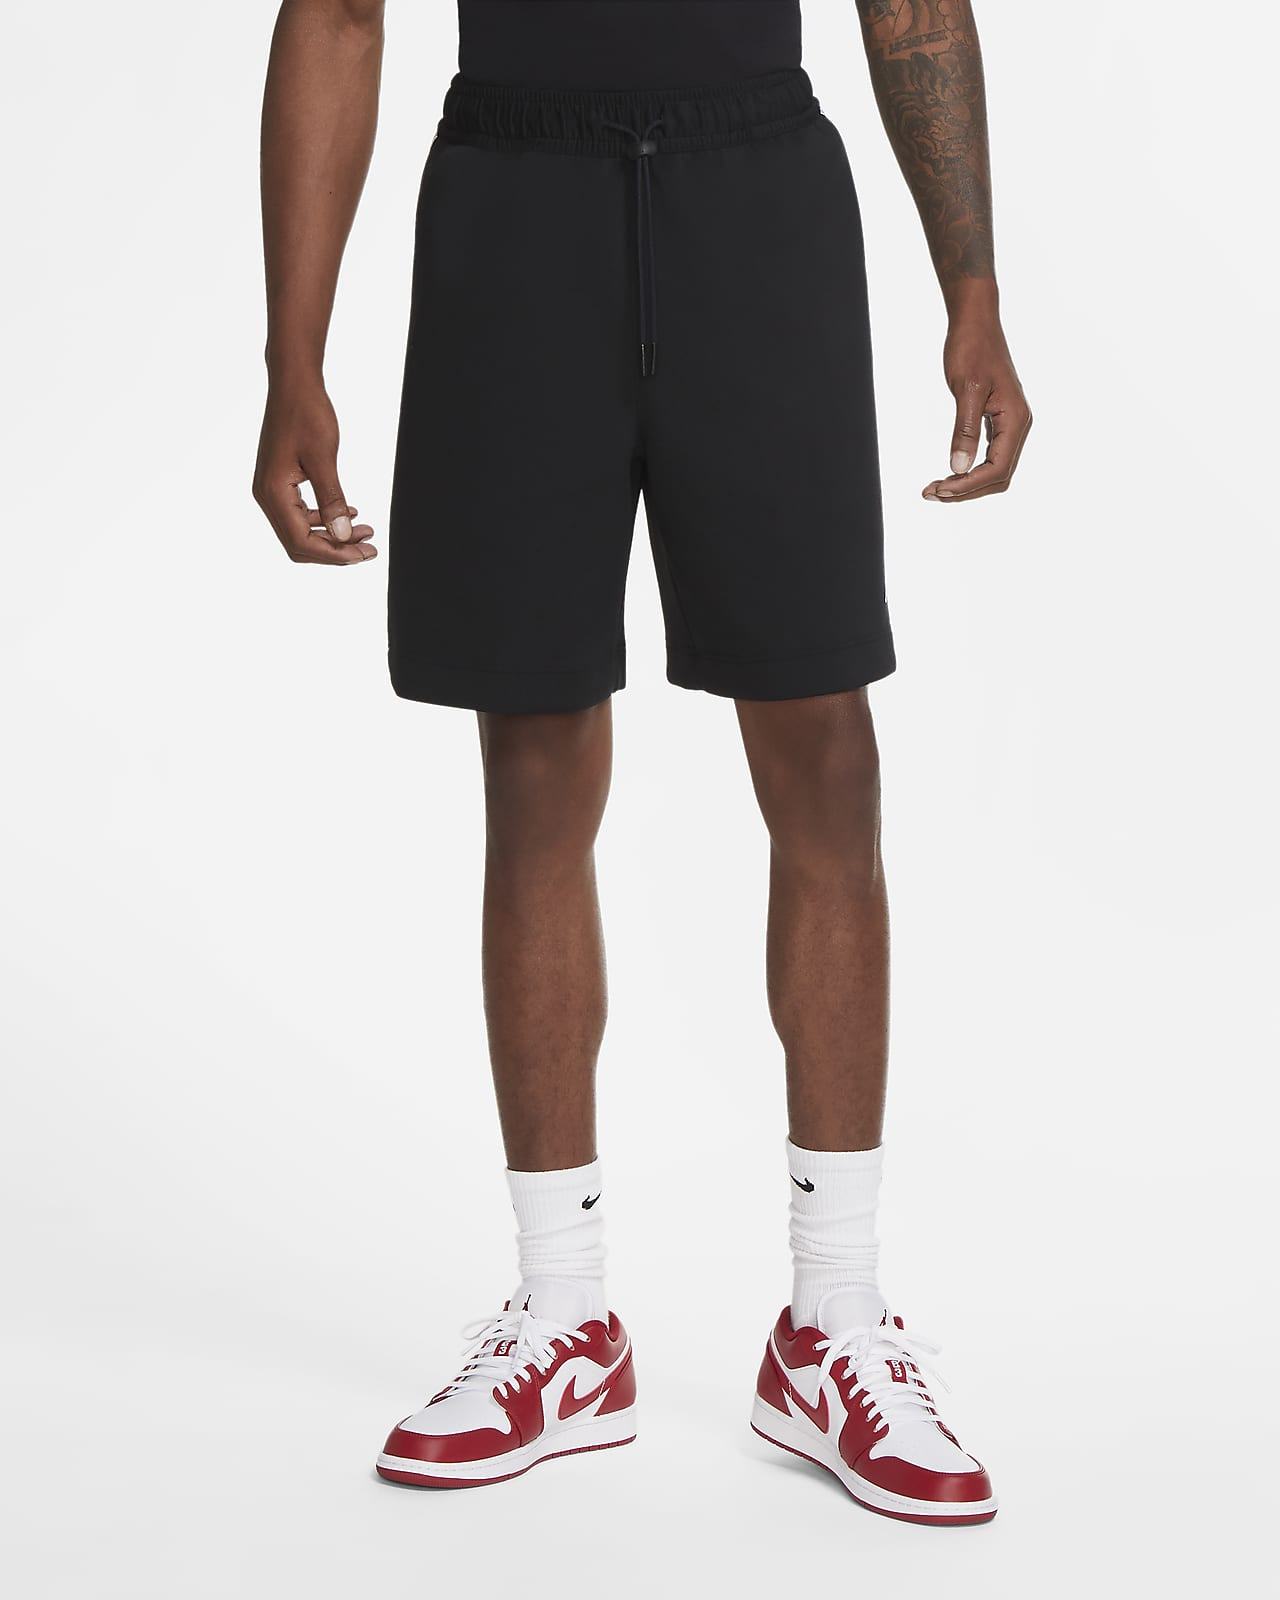 Jordan Air Men's Fleece Shorts